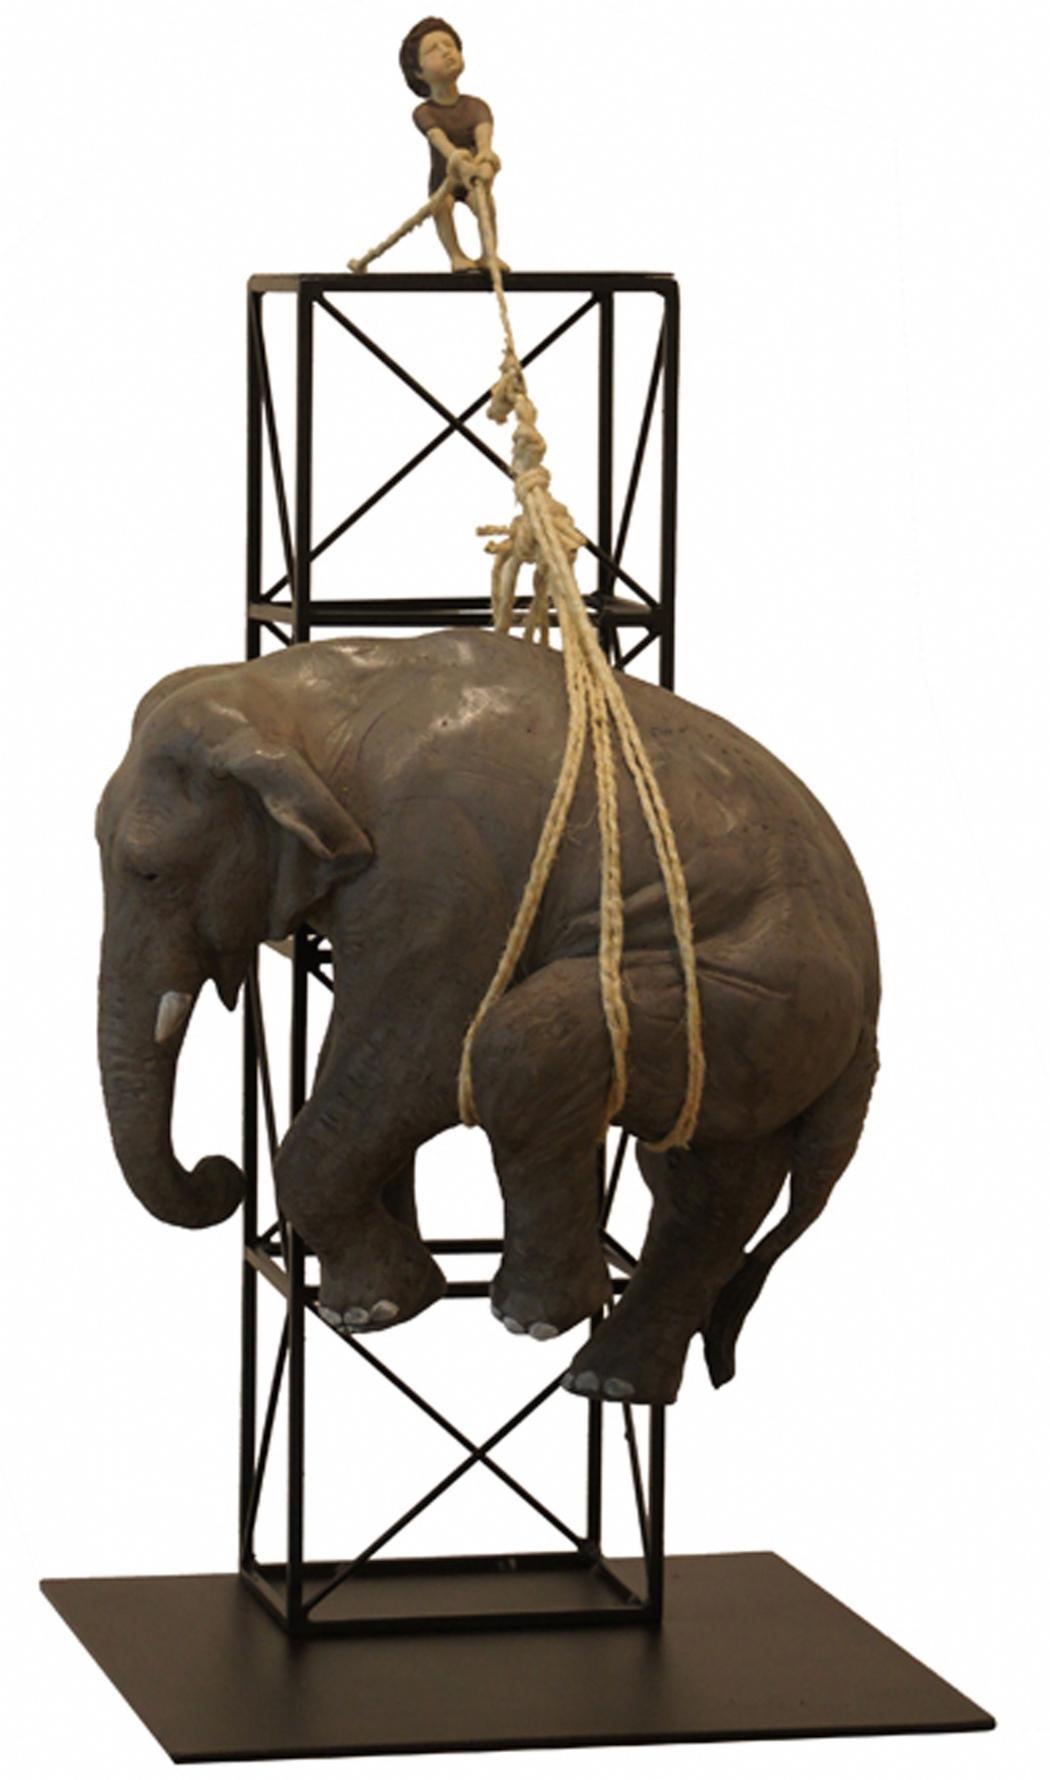 Mark Sachem Gallery, Stefano Bombardieri, Francesco E L'elefante 5/8, Bronze, 35x34x71cm, 2014